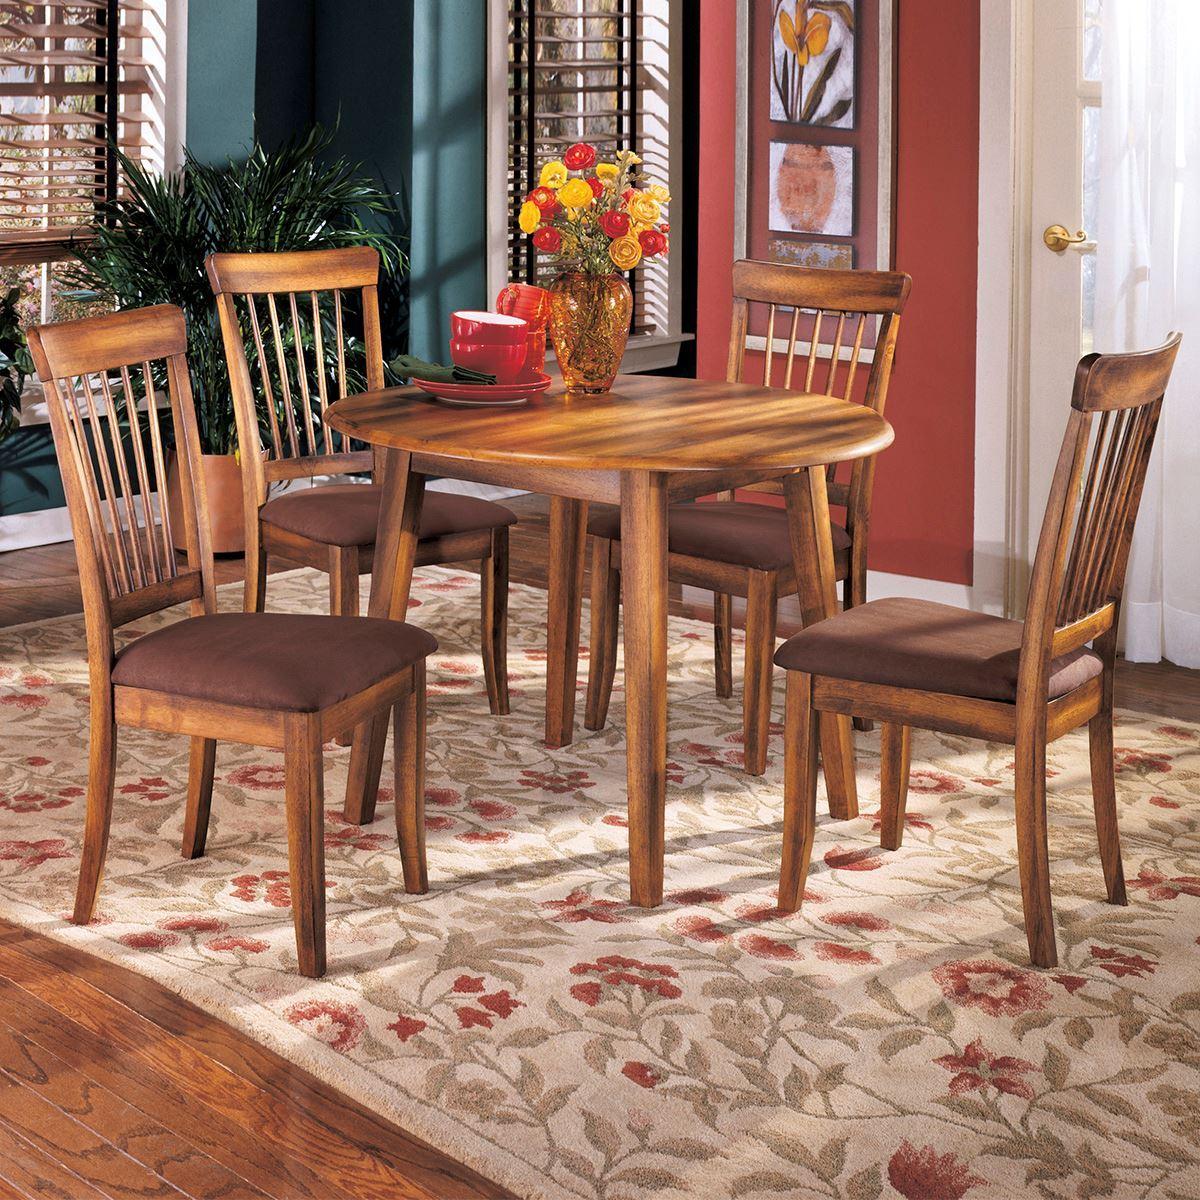 Five Piece Dining Room Sets: Napa 5 Piece Dining Set